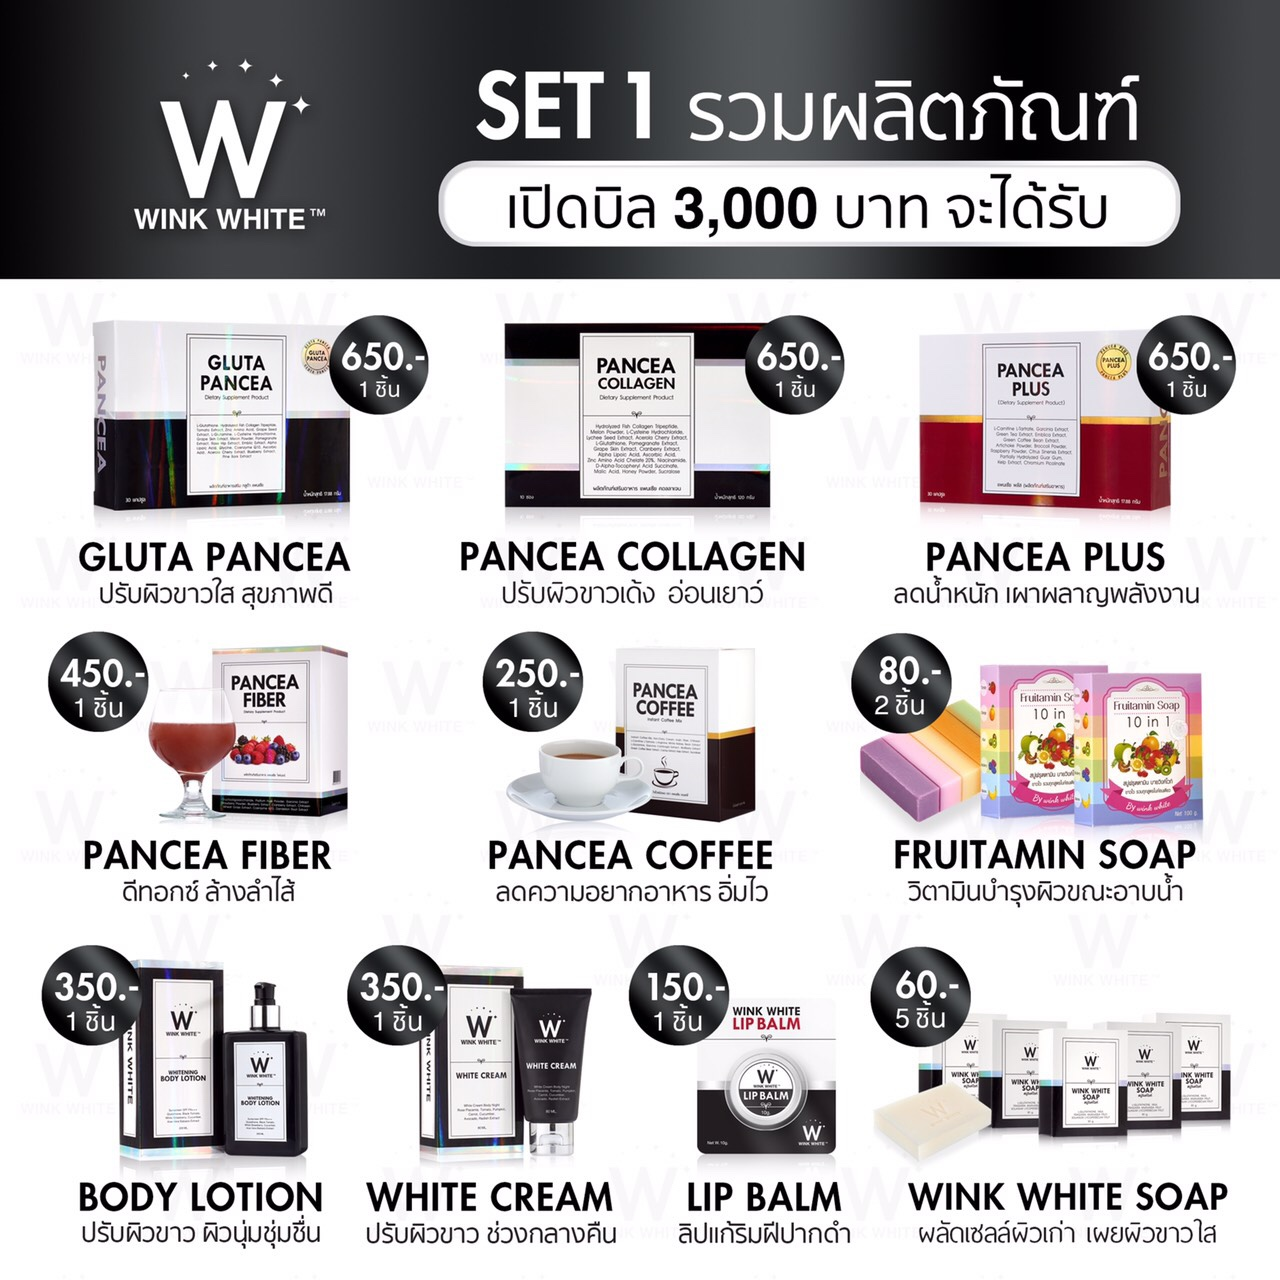 SET 1 รวมผลิตภัณฑ์ WINK WHITE